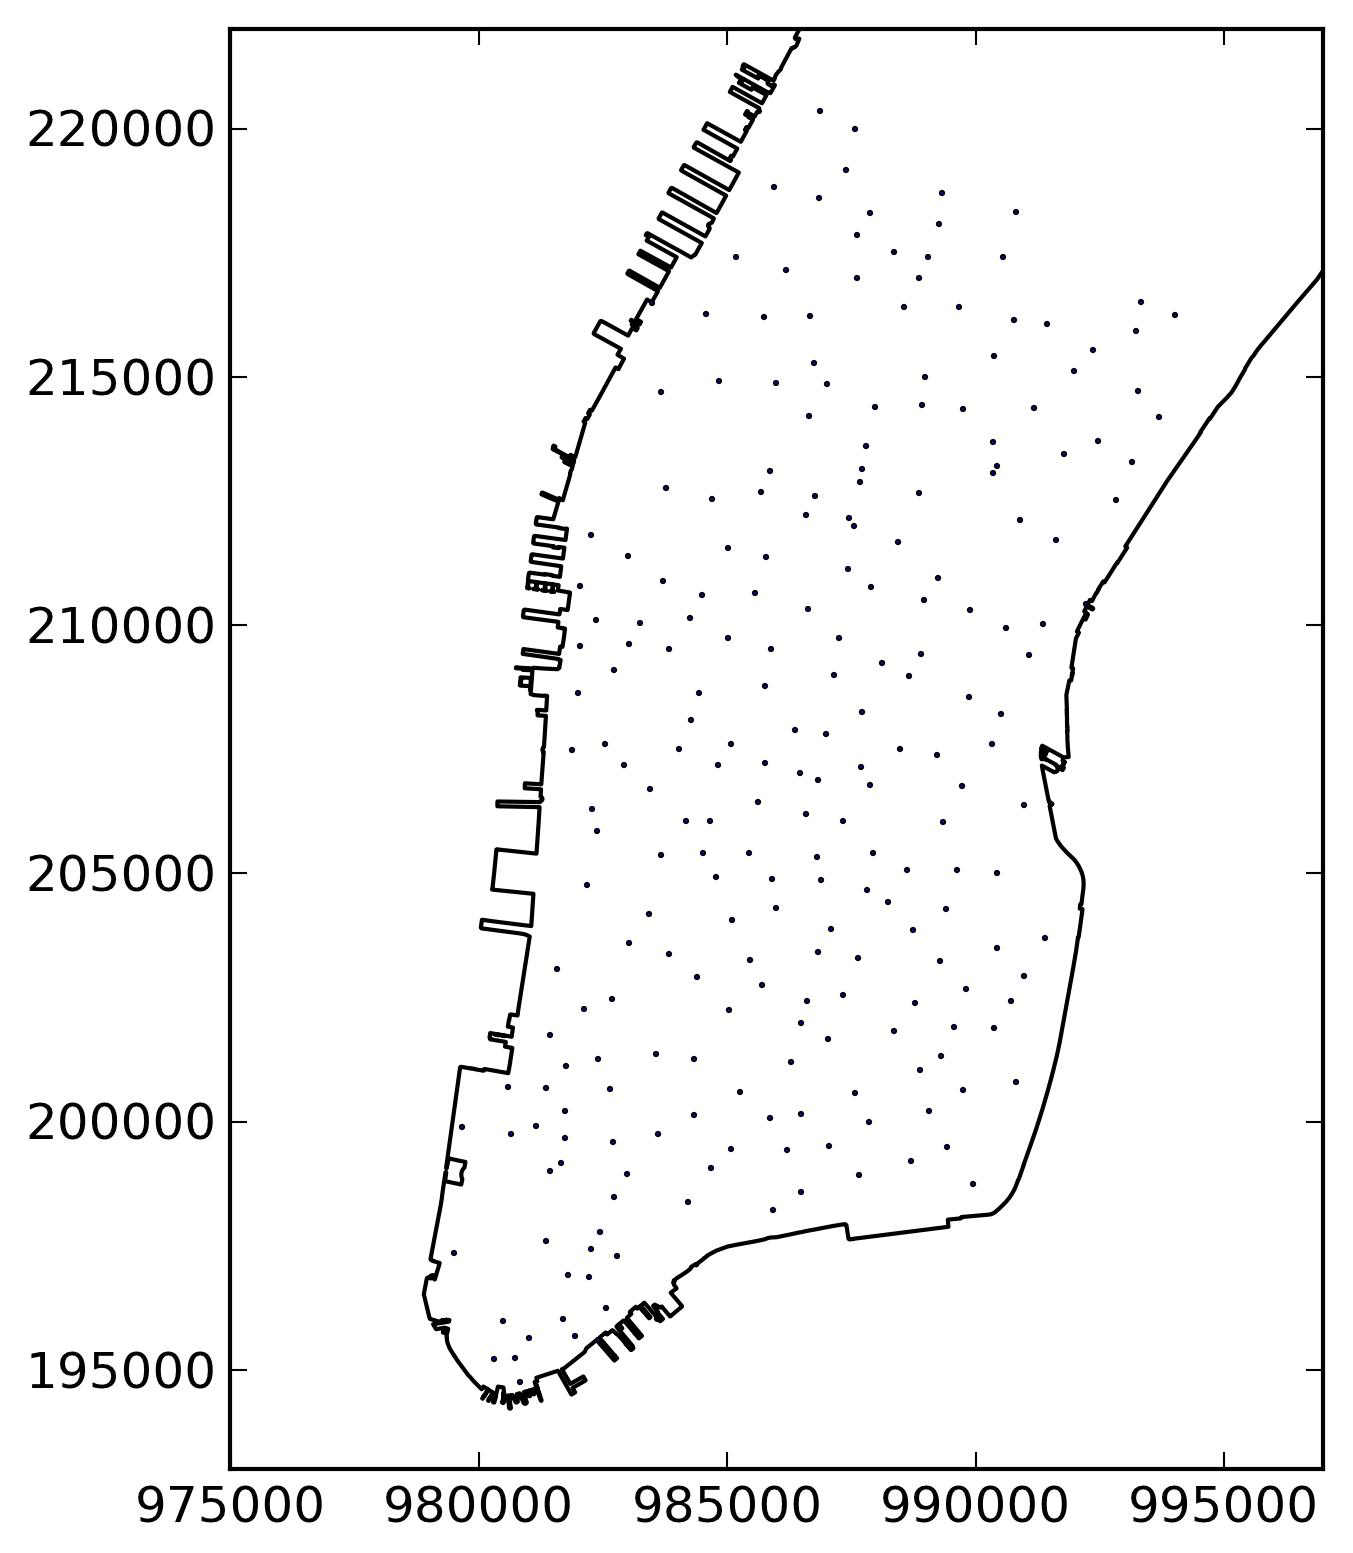 Using geospatial data with python - SciPy 2013